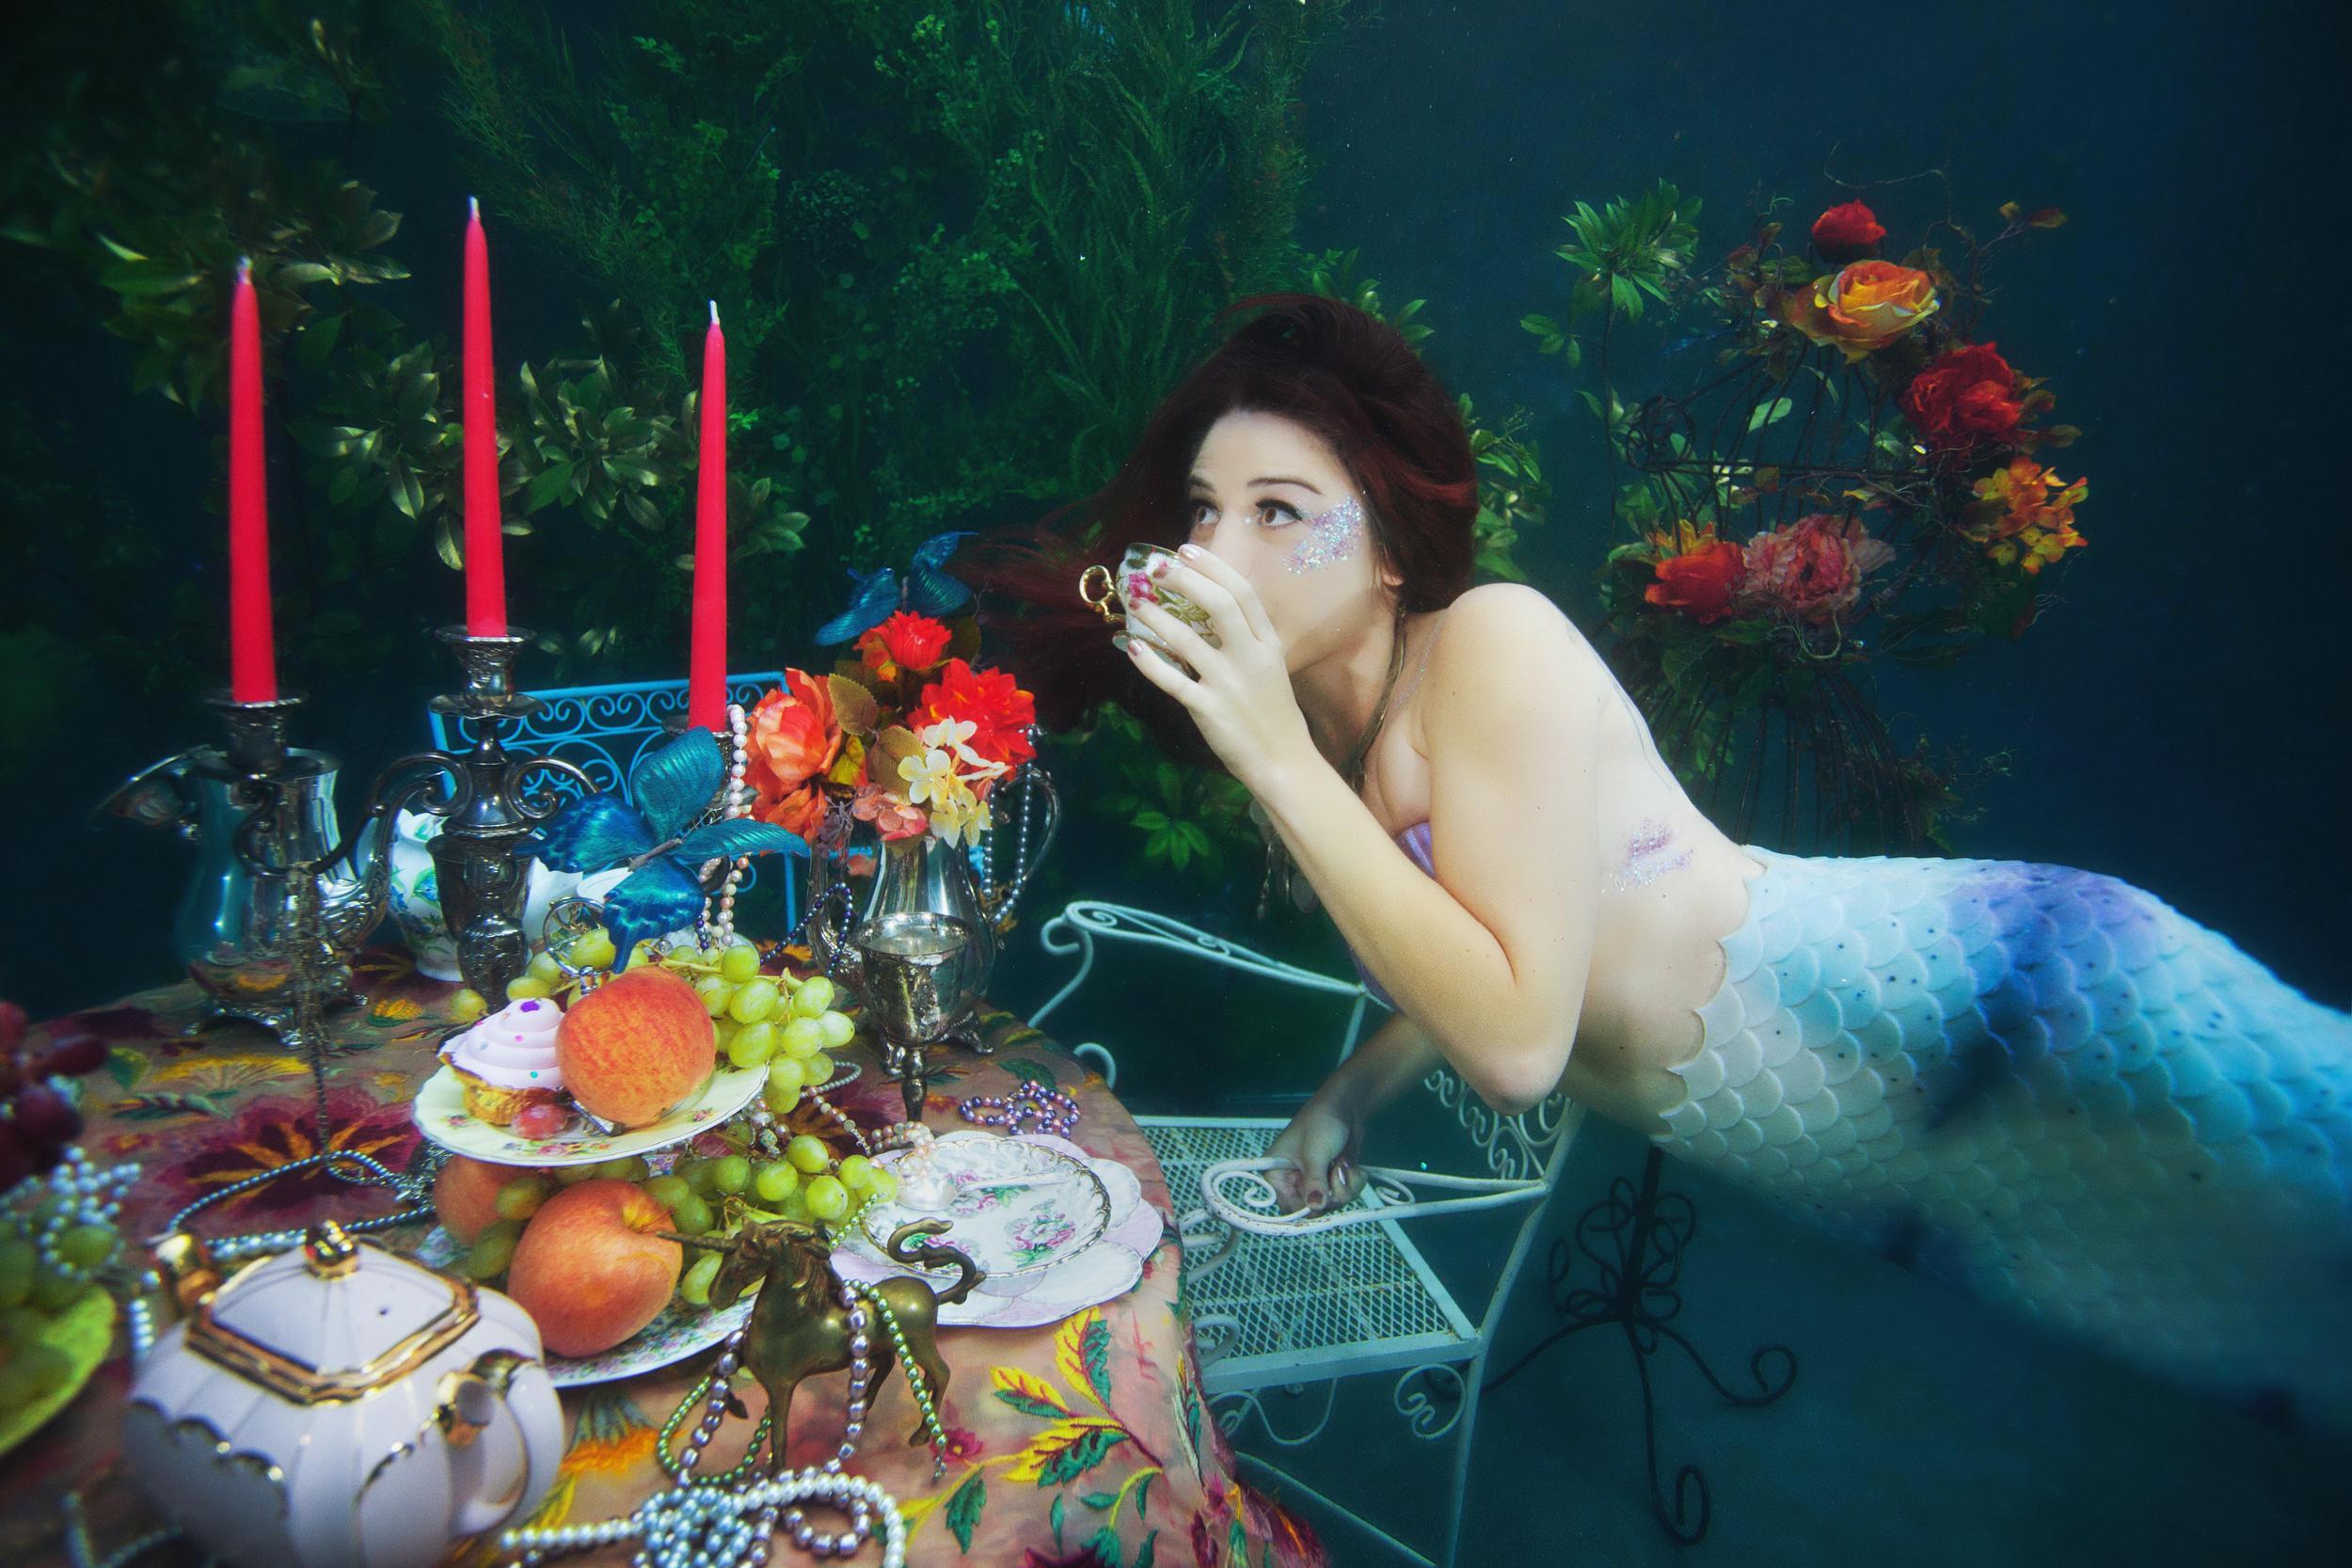 mermaidteaparty-4-(ZF-0463-12796-1-004).jpg